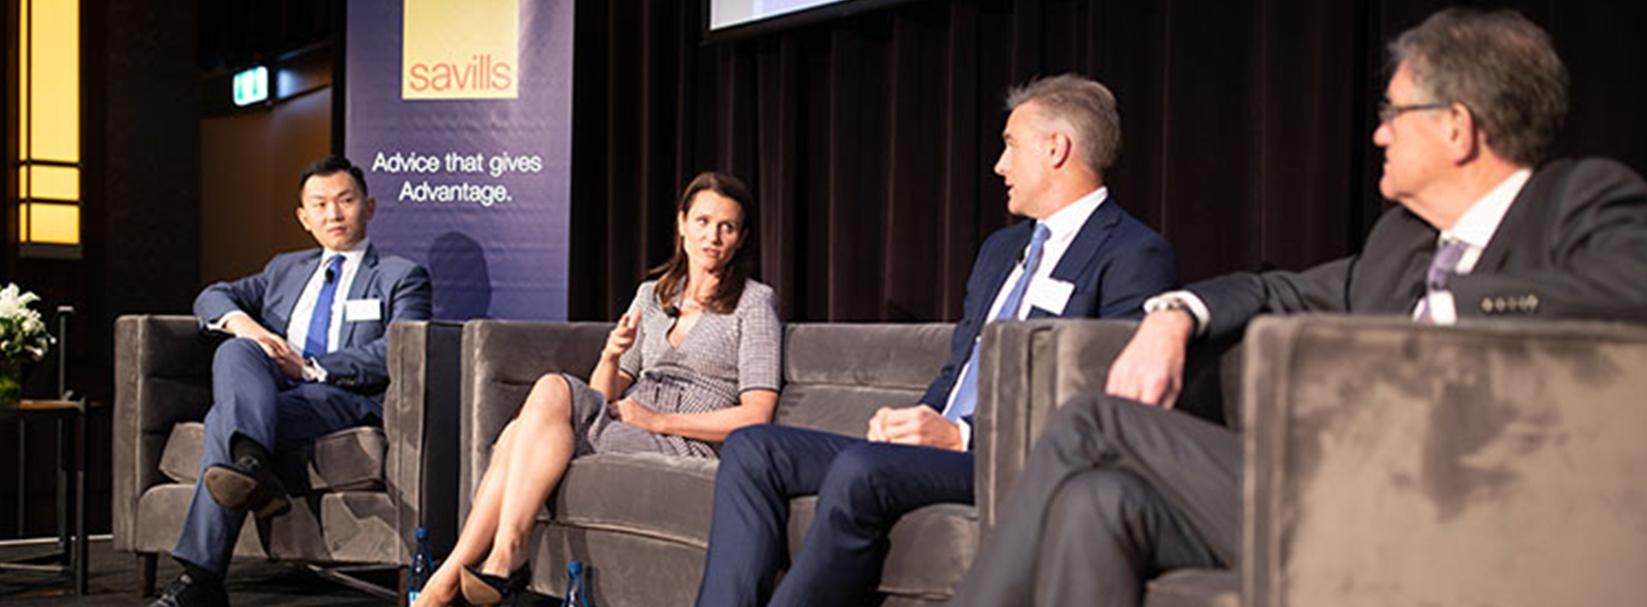 Tech, industrial sectors to reshape Melbourne